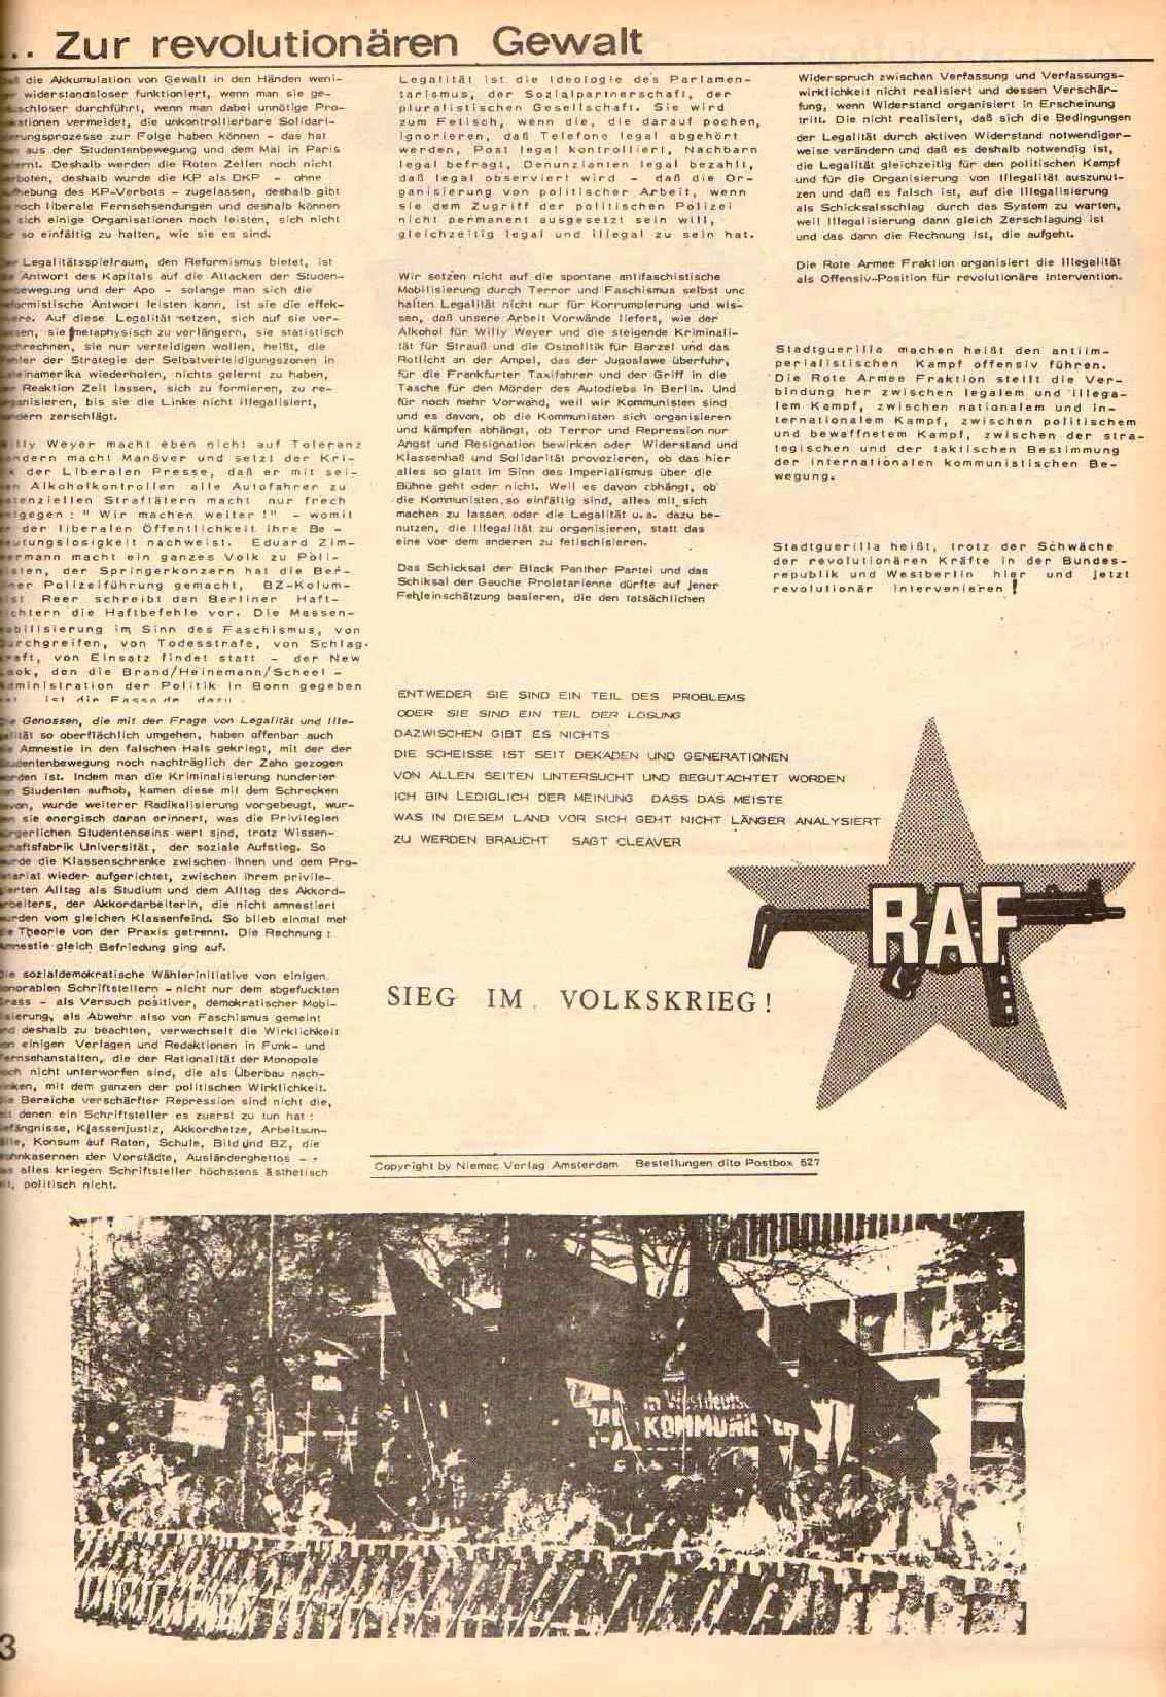 Berlin_Hochschulkampf_1971_09_13